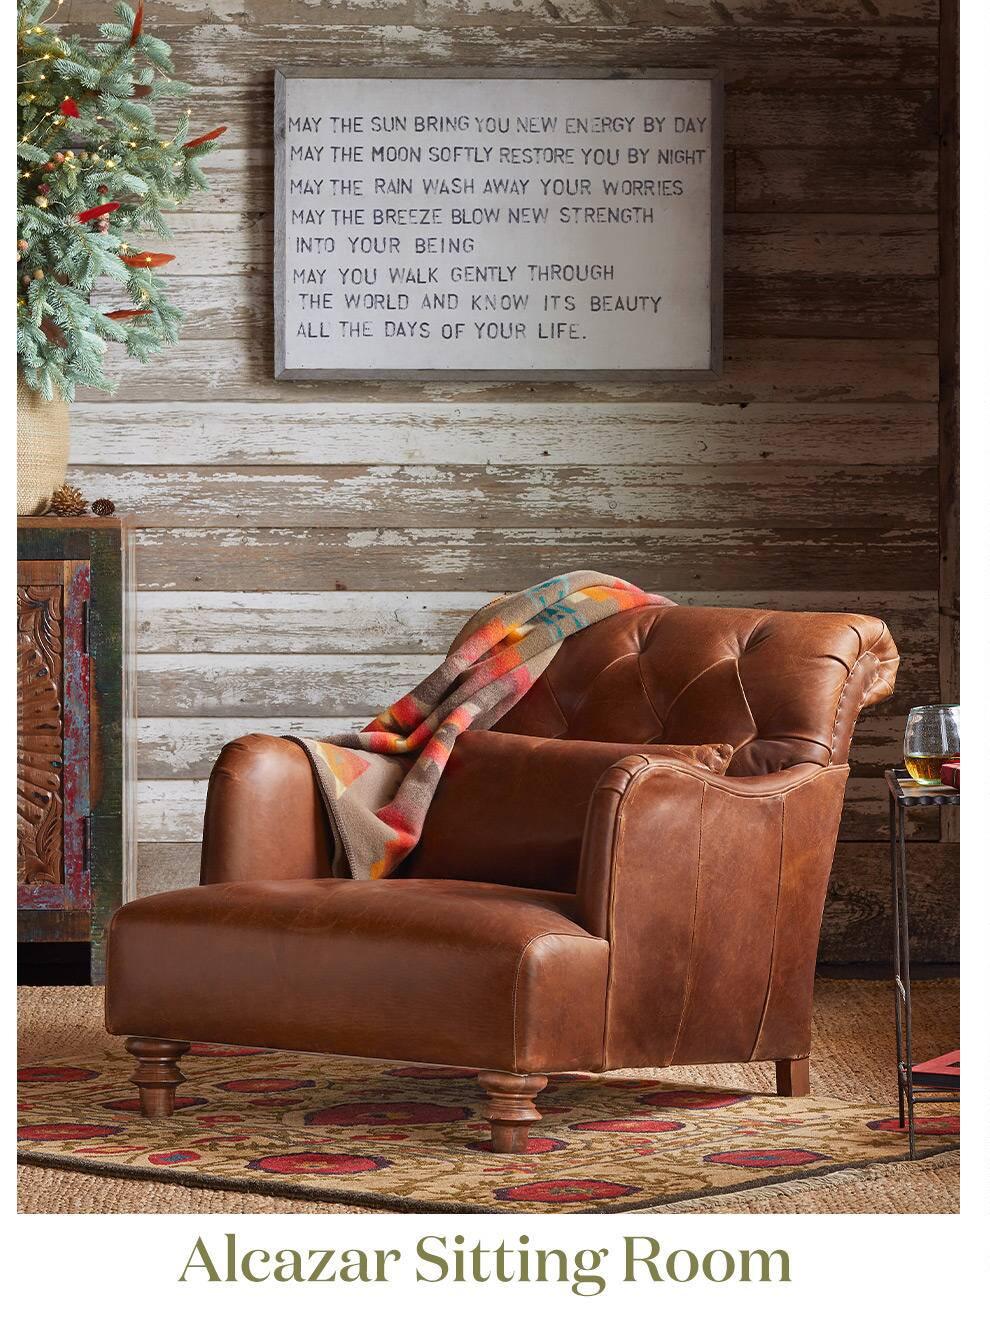 Alcazar Sitting Room